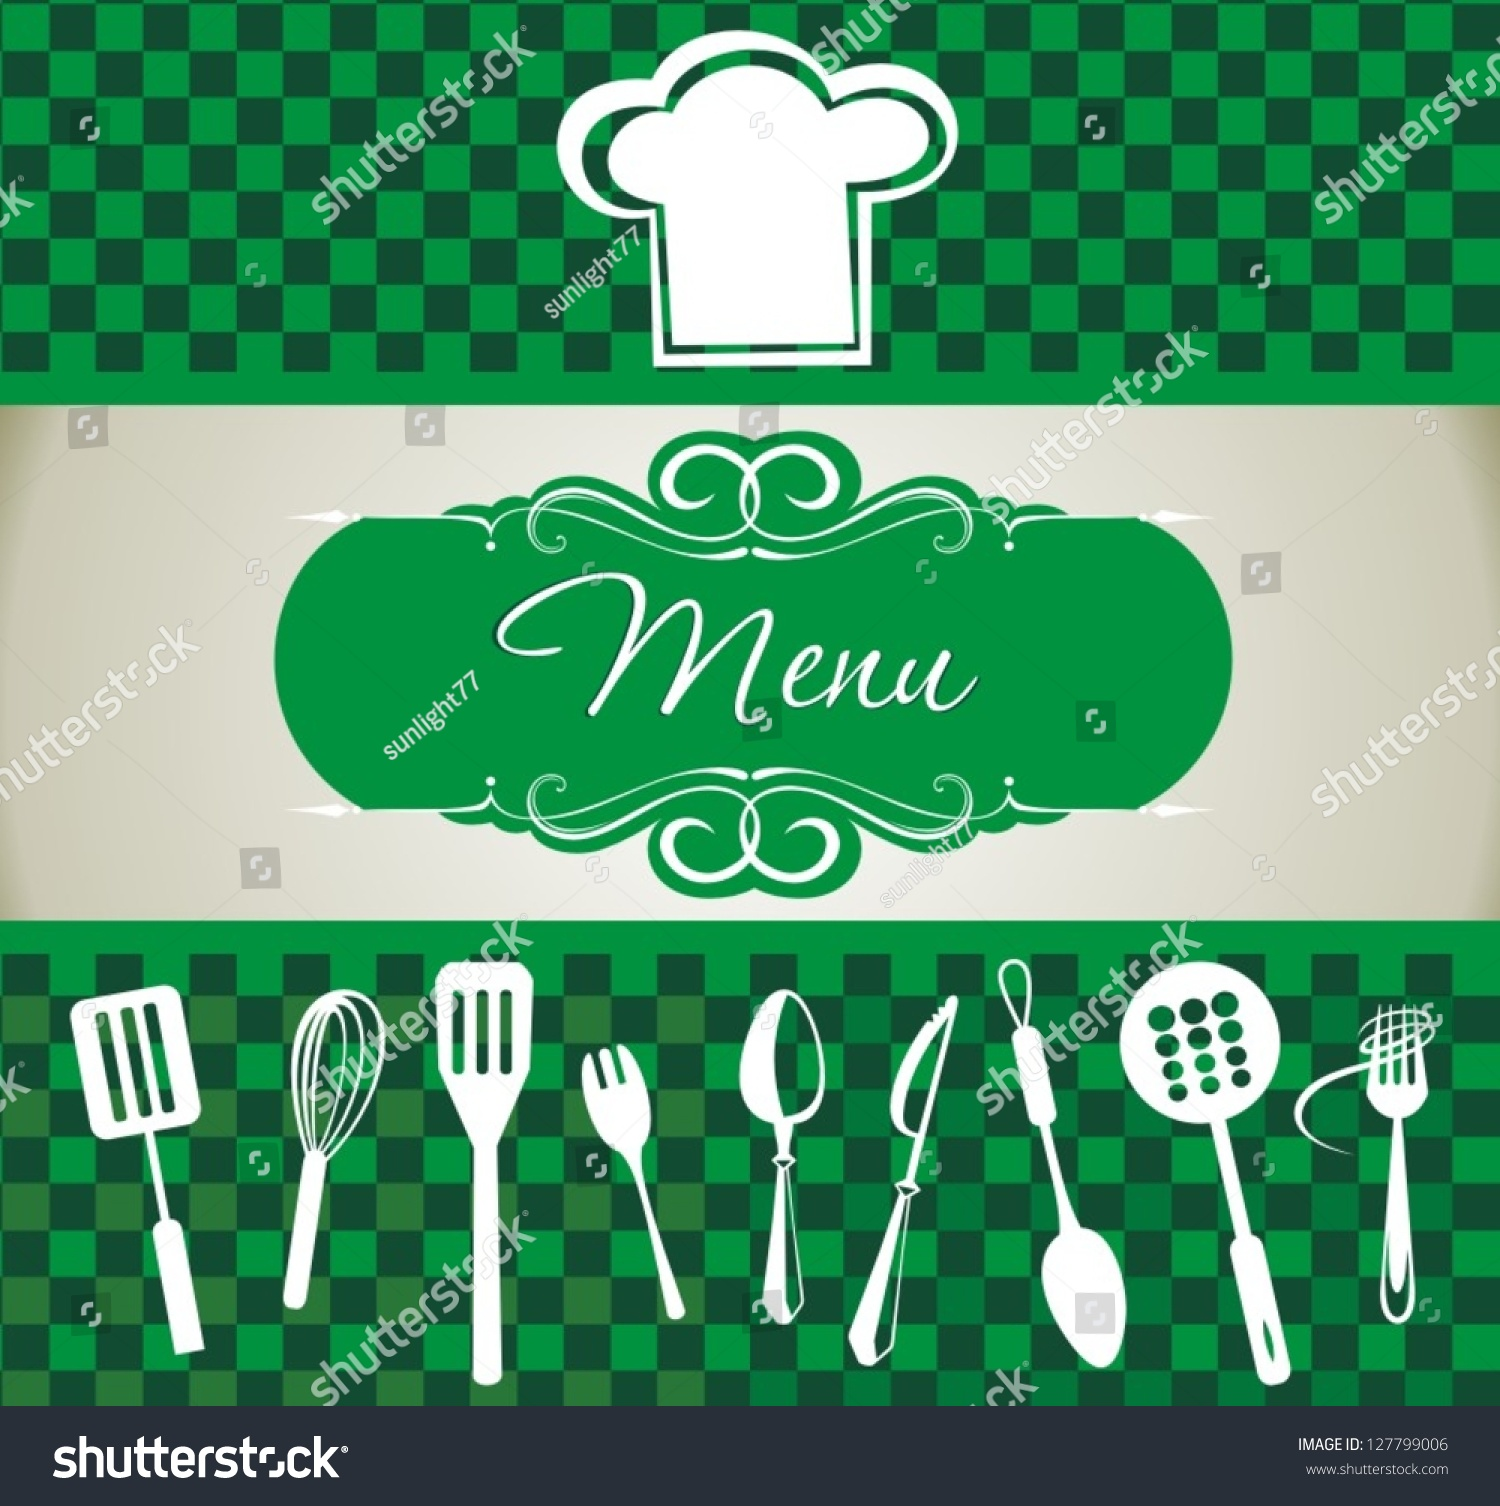 Restaurant menu design background stock vector